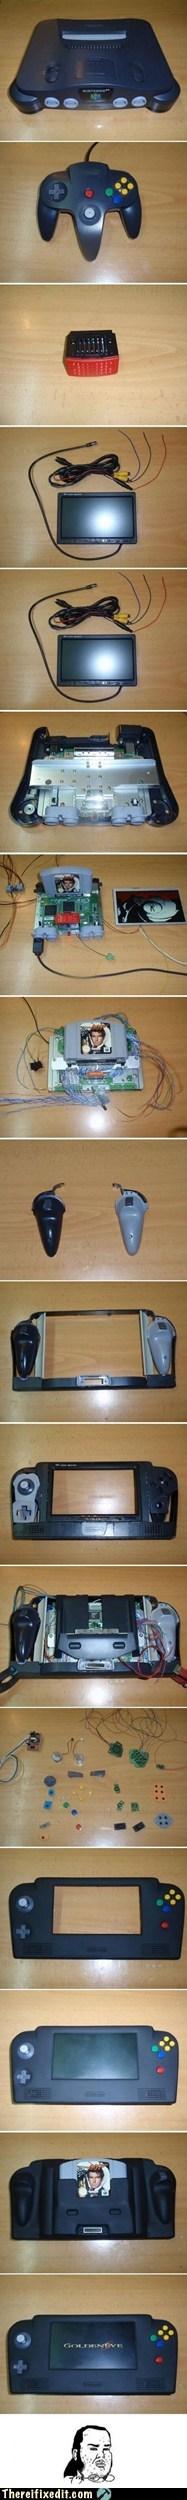 console n64 nintendo nintendo 64 portable - 6157738752